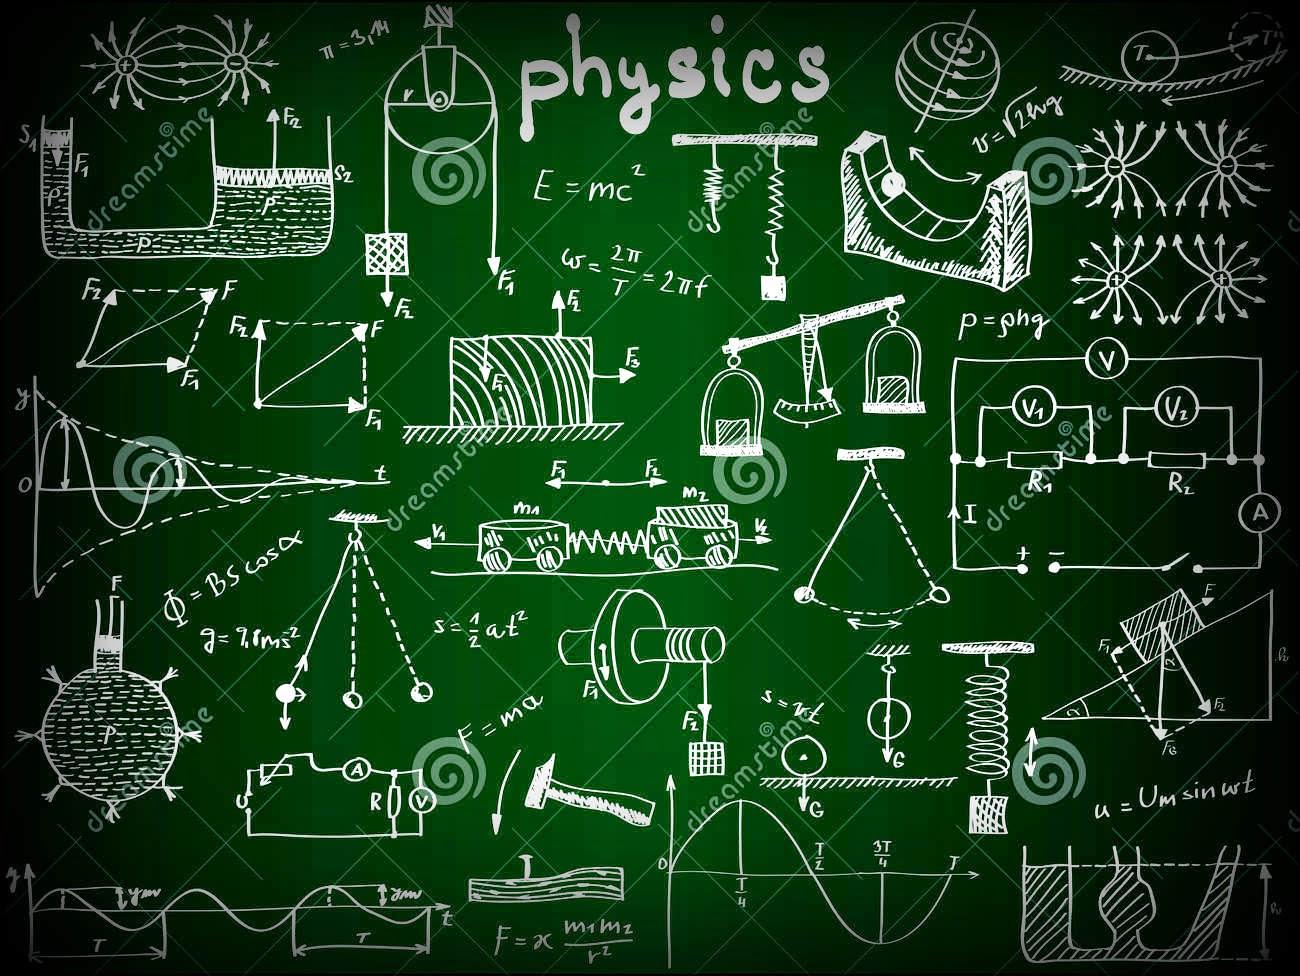 Physics formula book for IIT-JEE (Resonance Gyan Sutra ...